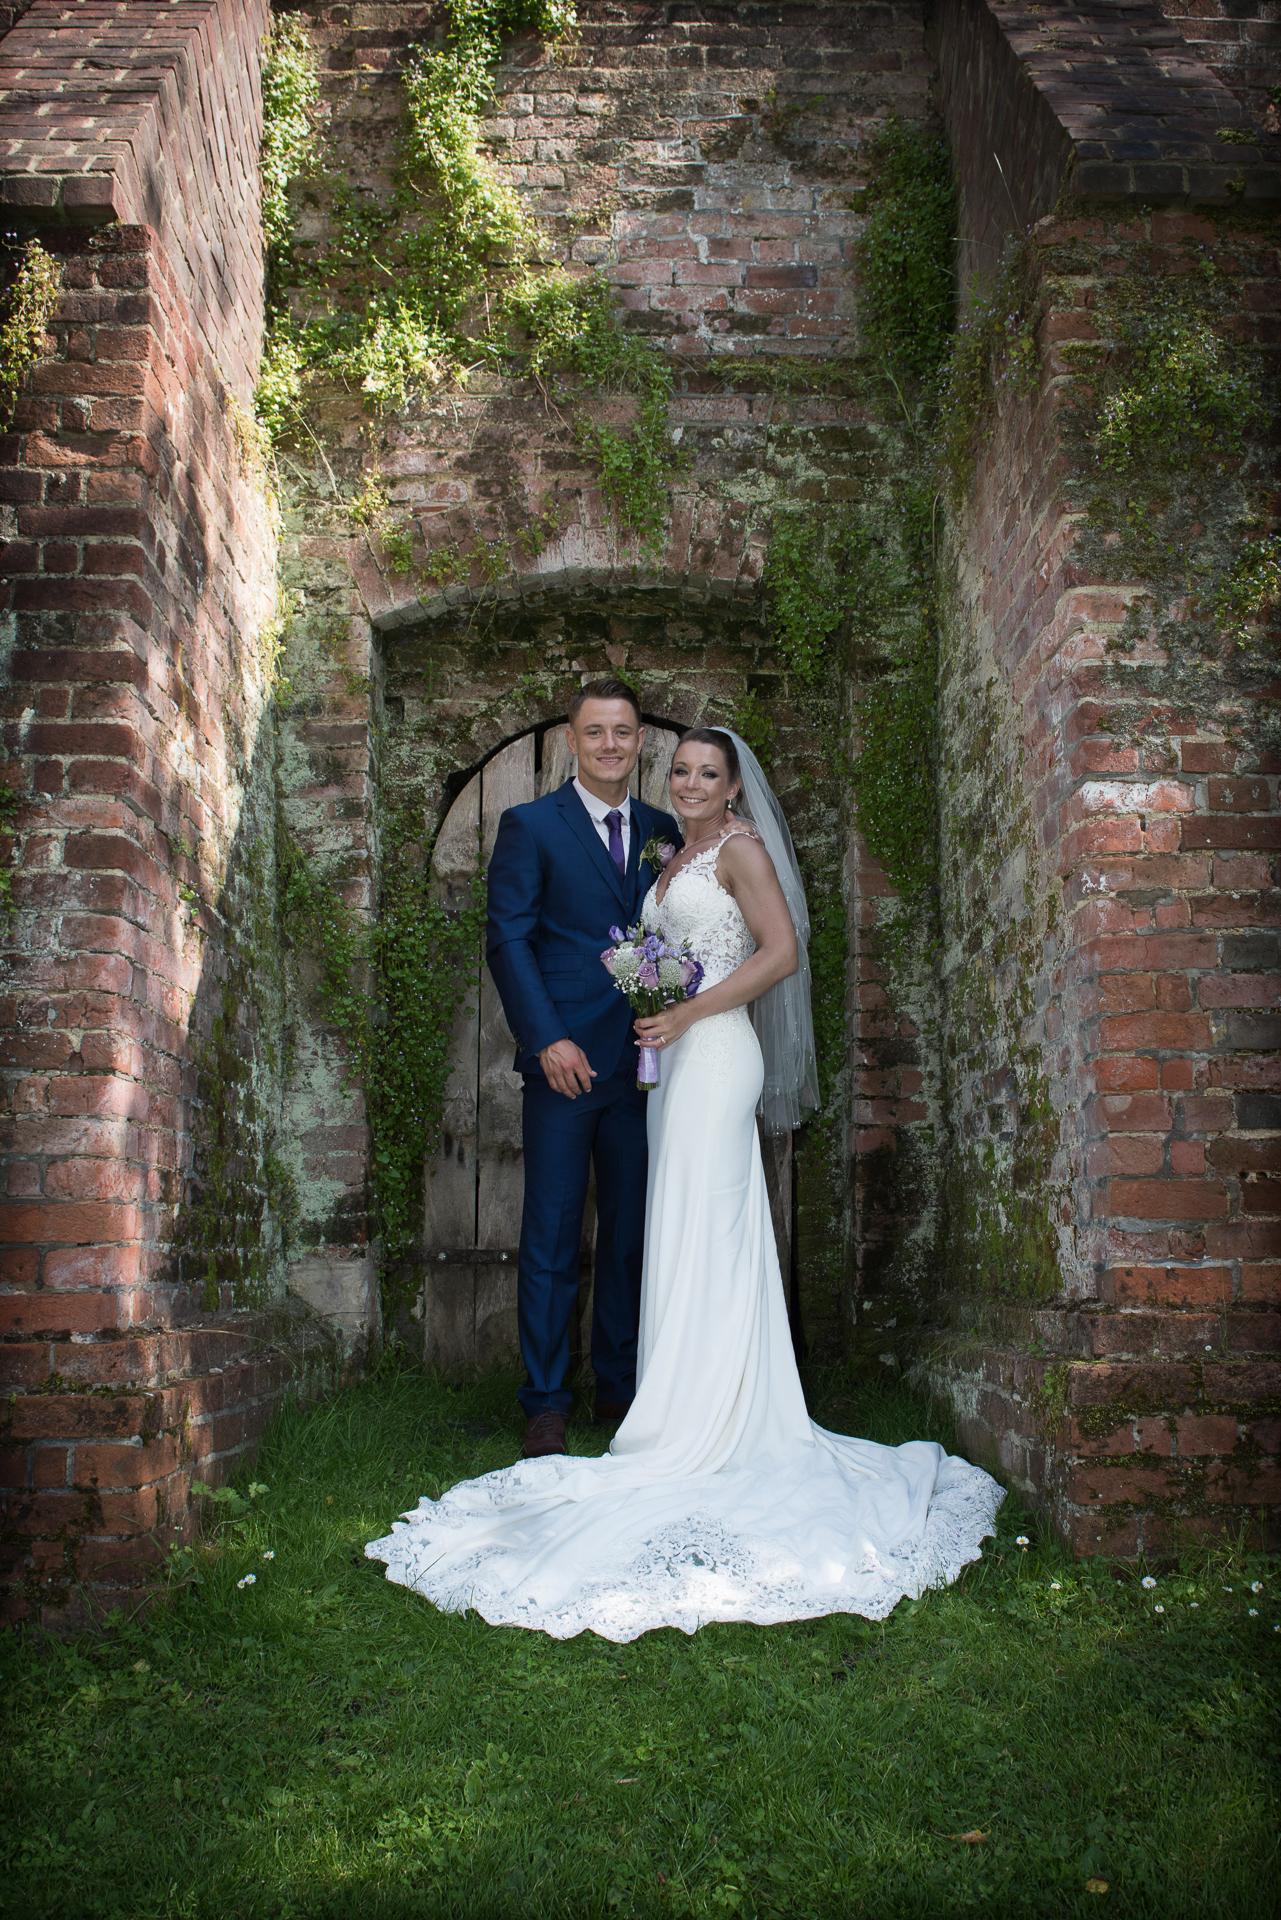 Ufton Court Wedding Photography27.JPG